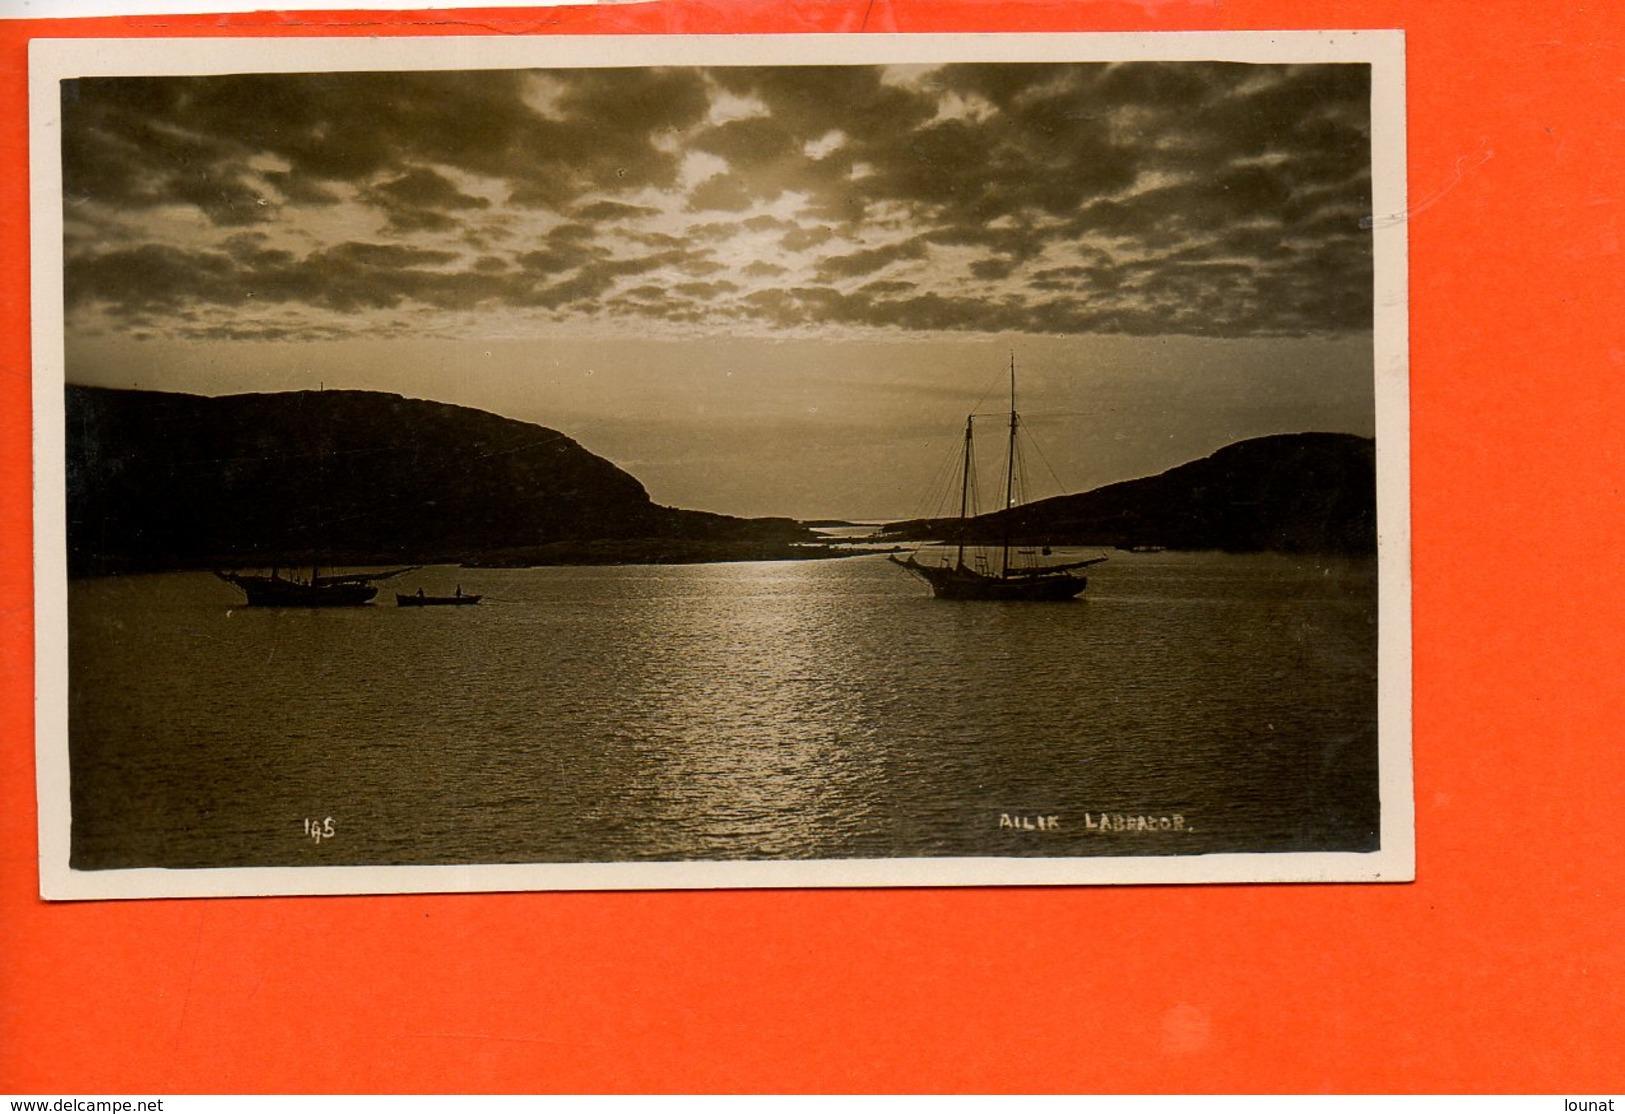 Newfoundland - S.H. Farsons & Sons, St John's, - Labrador(dimensions 13.8 X 8.5) - St. John's